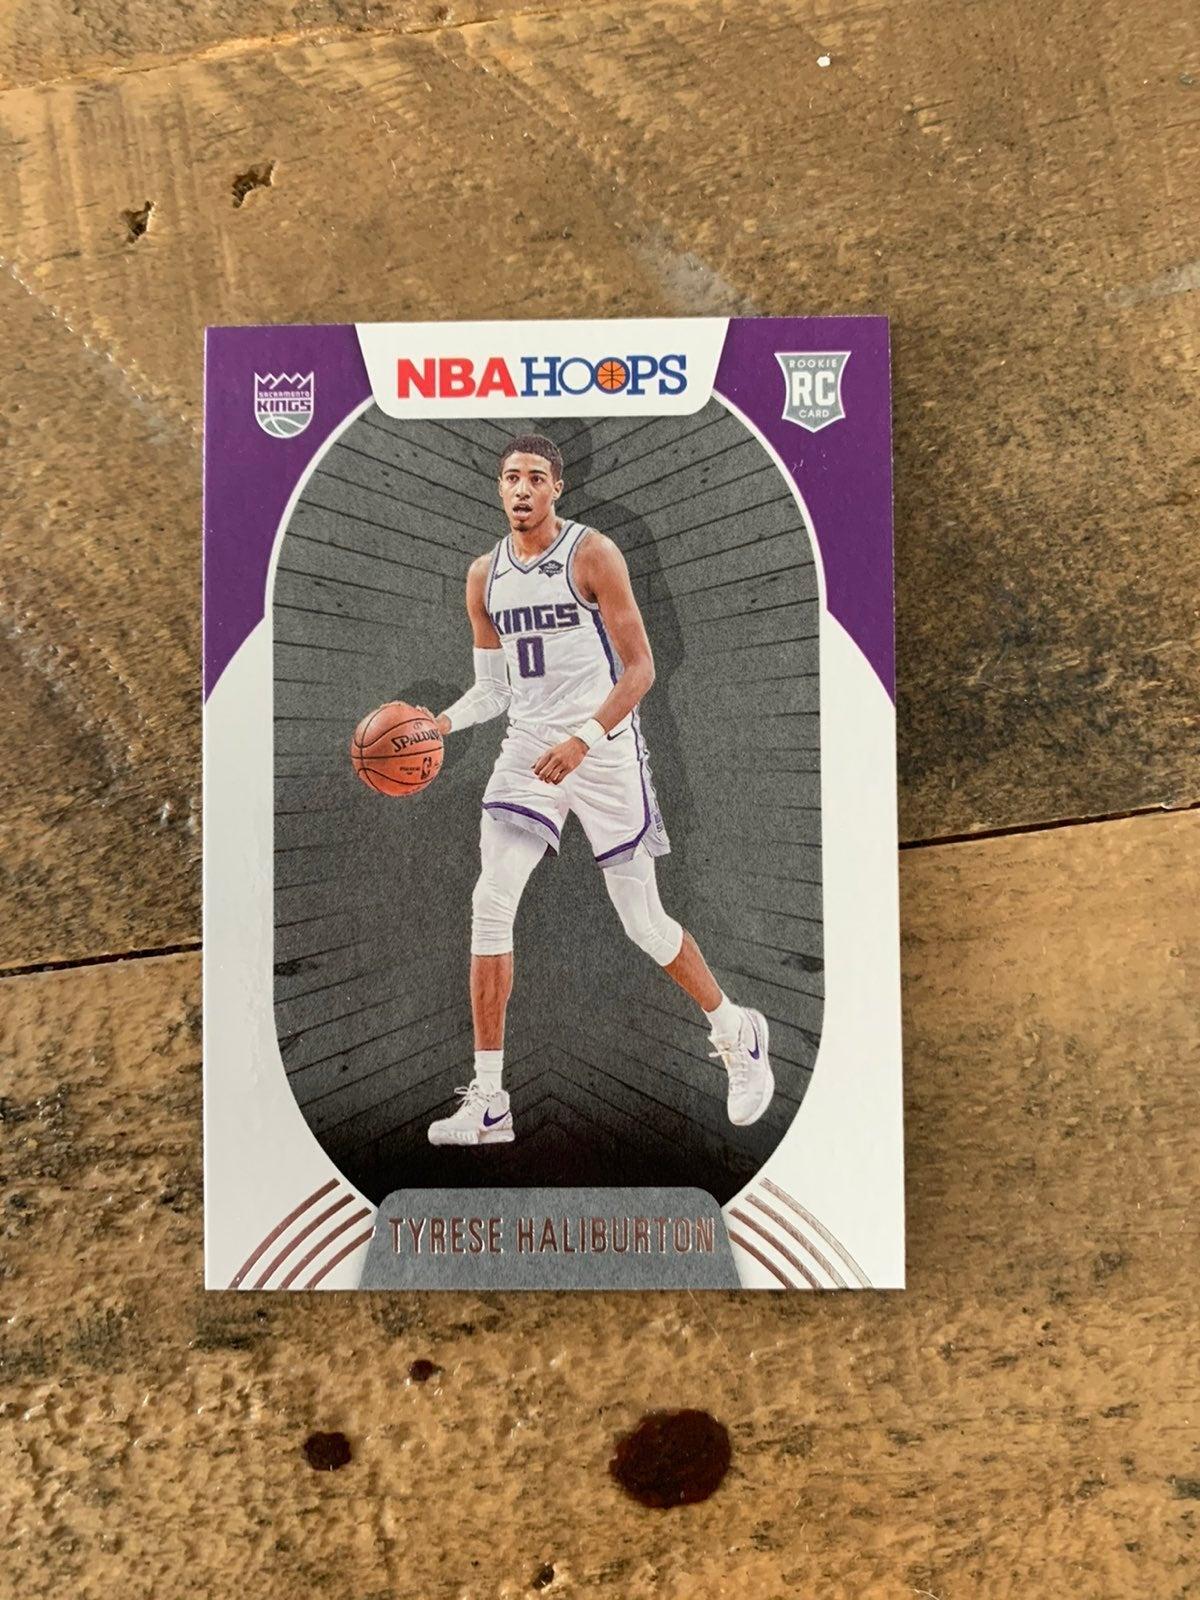 Tyrese Haliburton NBA rookie card